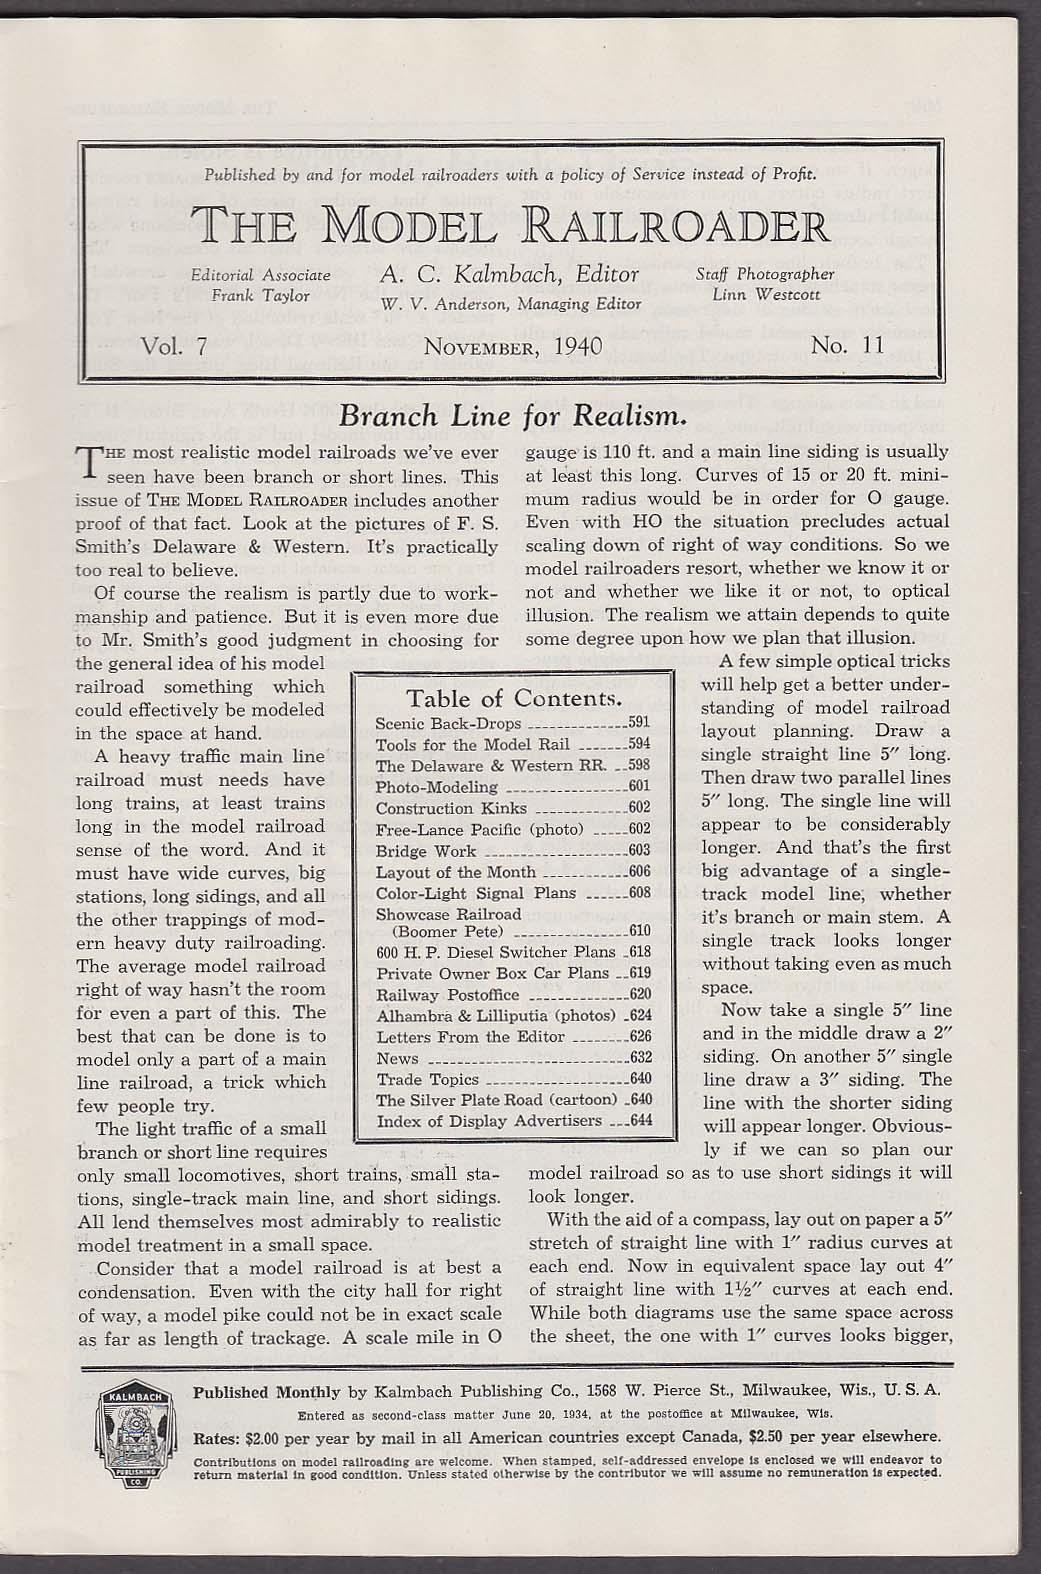 Image for MODEL RAILROADER Delaware & Western Railroad Diesel Switcher Plans ++ 1 1940